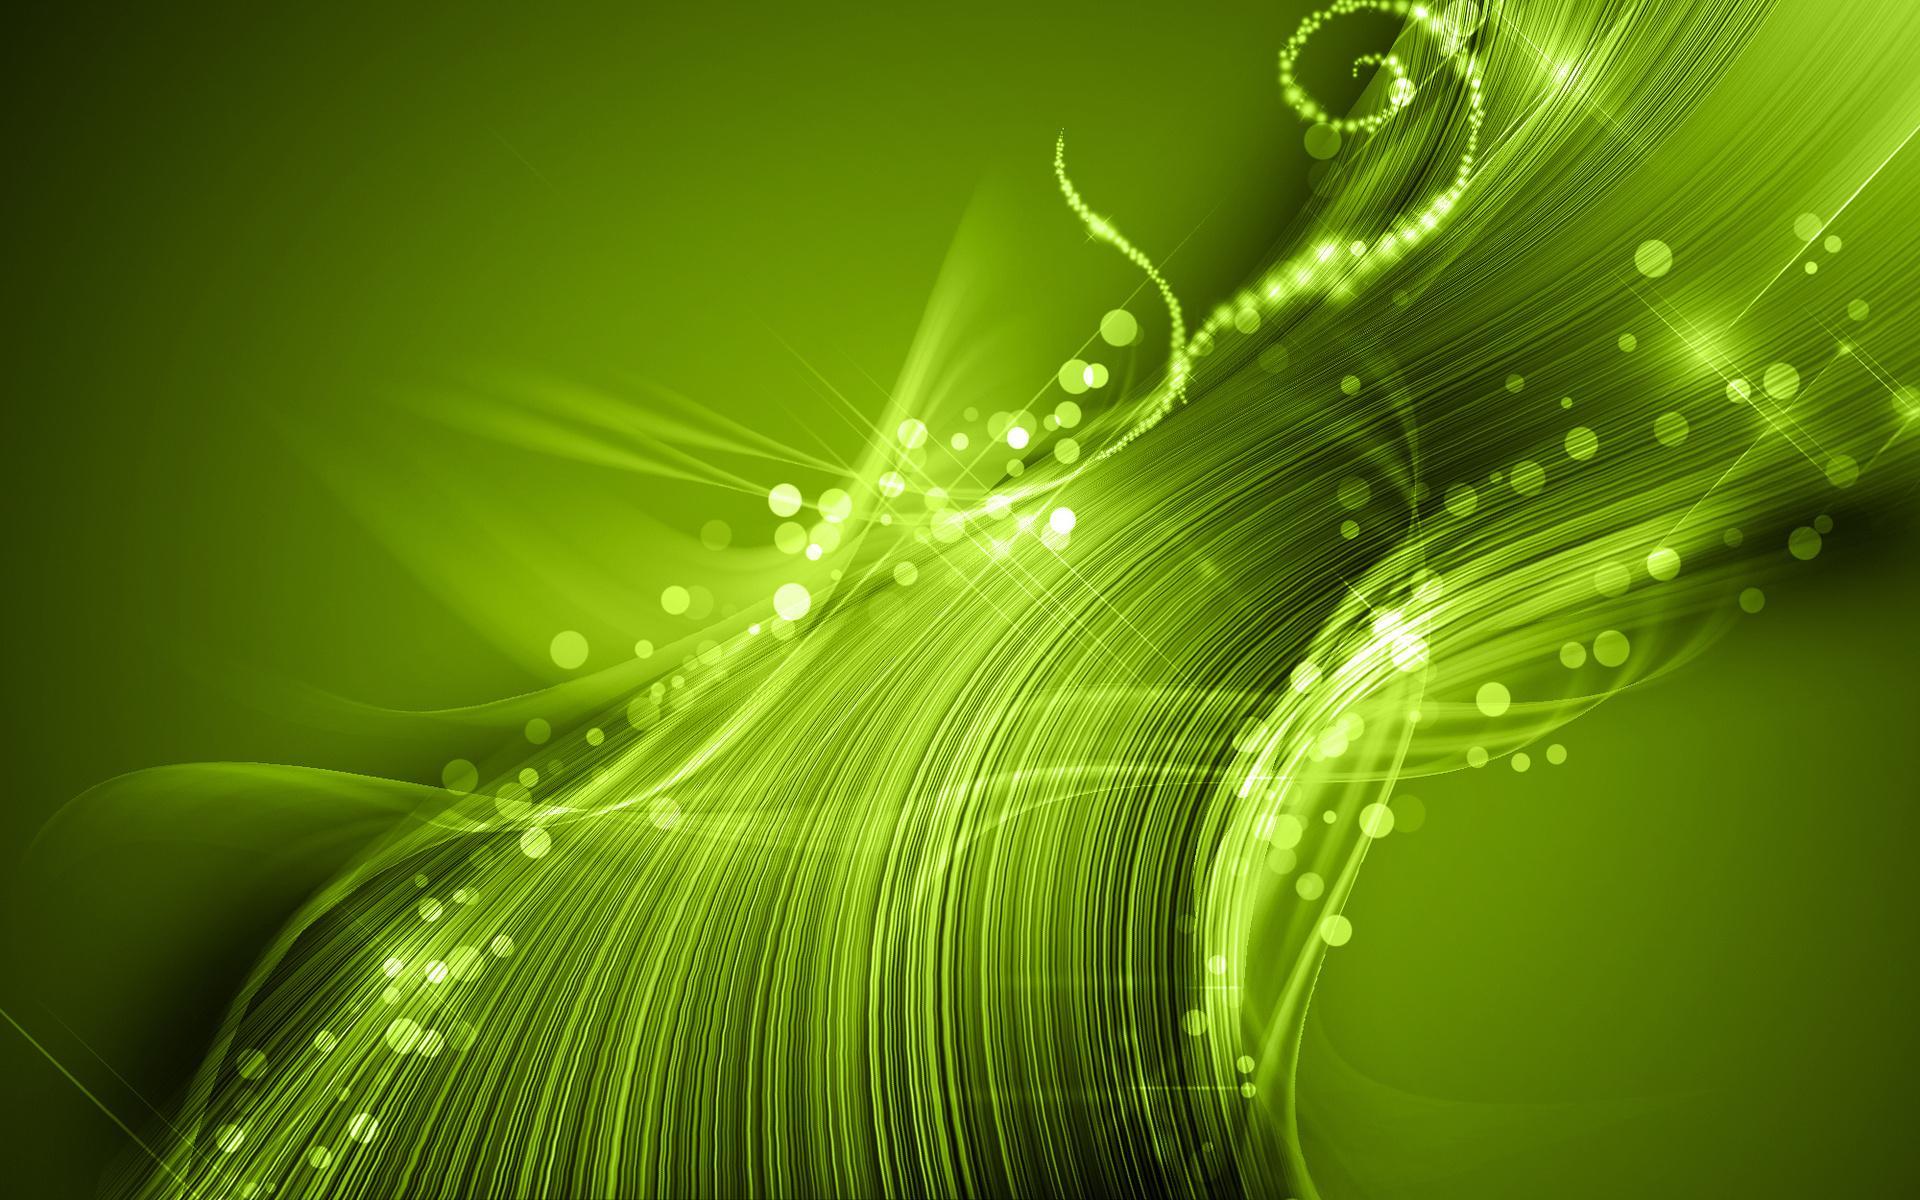 Симпатичная зеленая абстракция 1920x1200